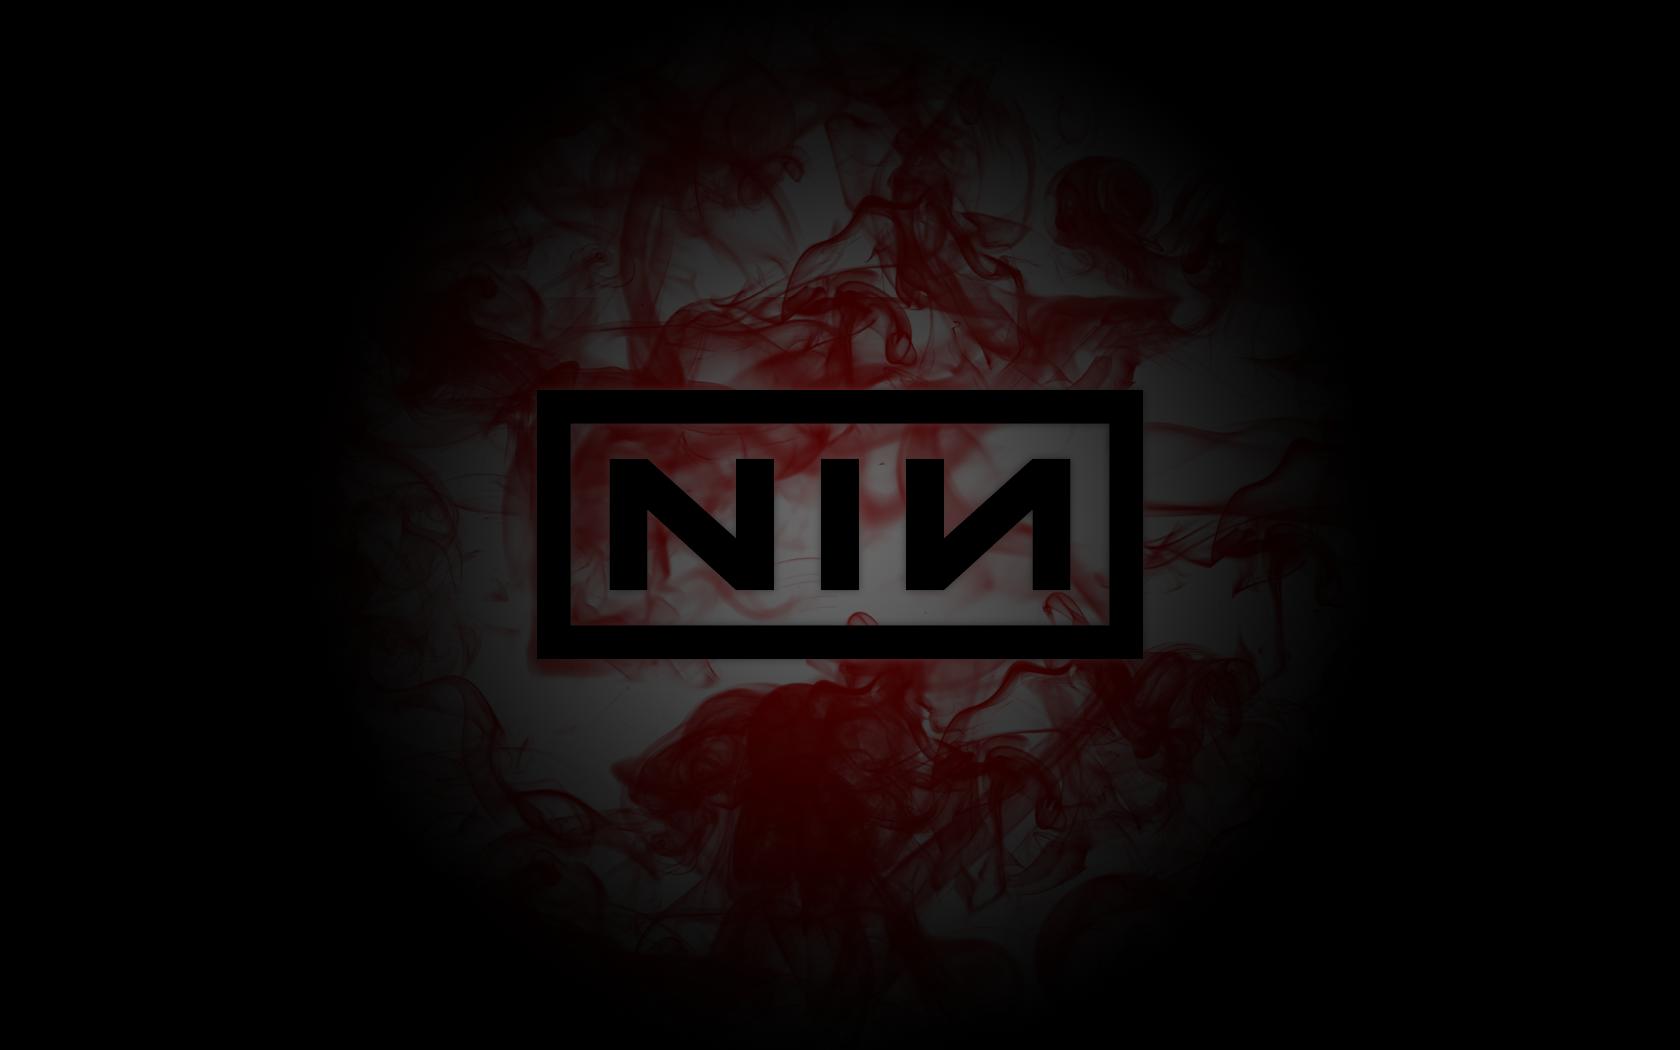 Nine Inch Nails background 1 by omgomgya on DeviantArt